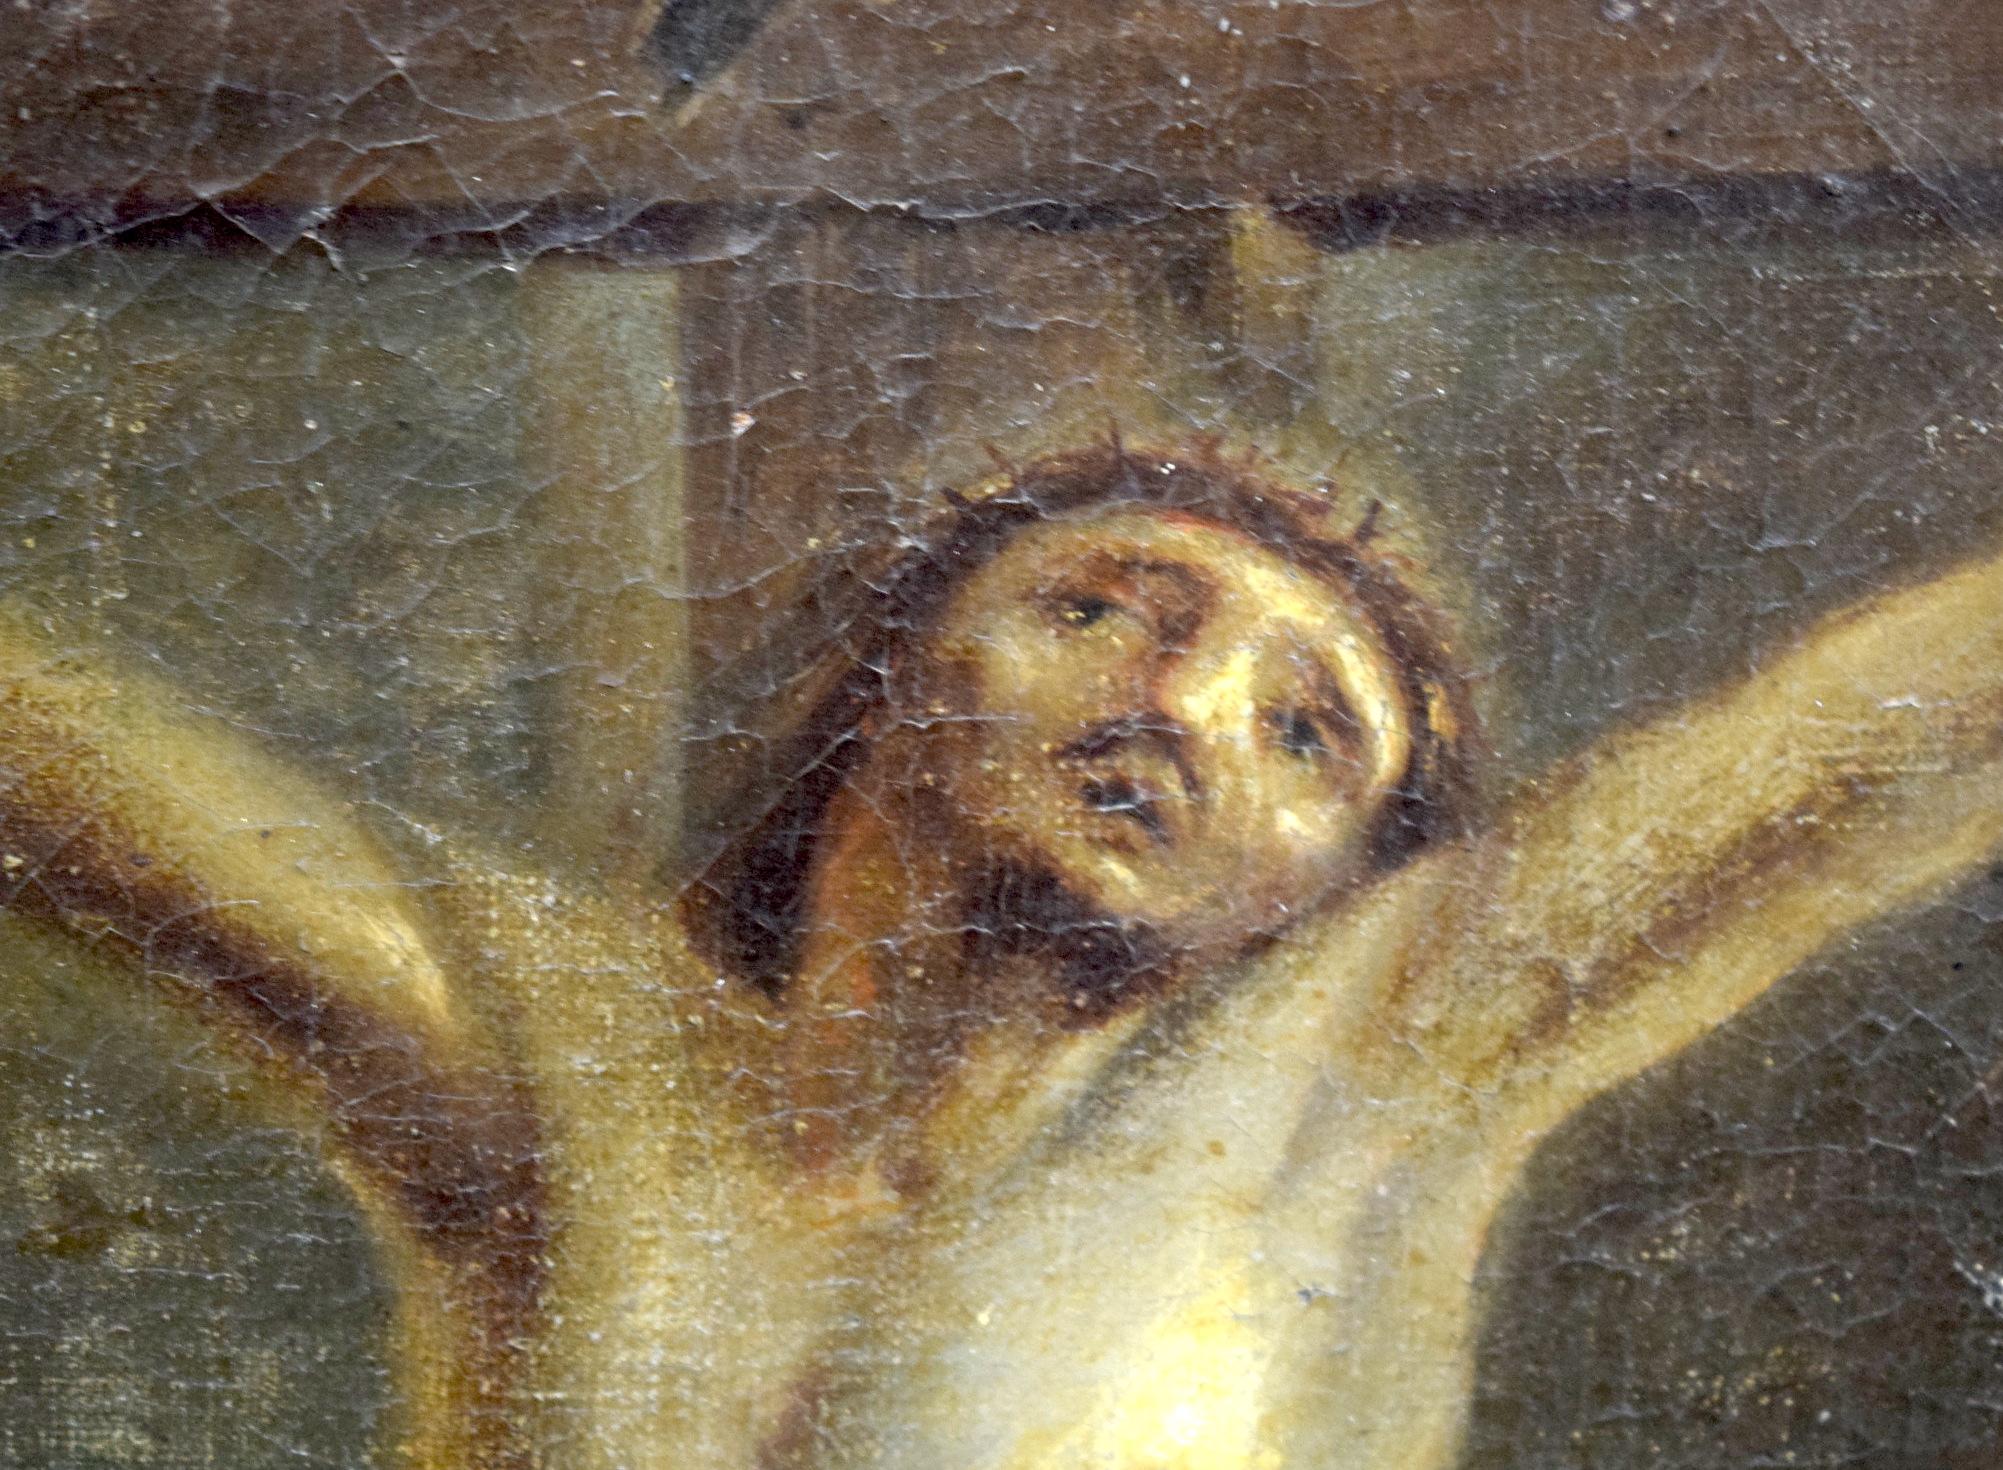 Lot 2047 - ITALIAN SCHOOL (18th century) FRAMED OIL ON CANVAS, Jesus christ on a crucifix, 62 cm x 47 cm.